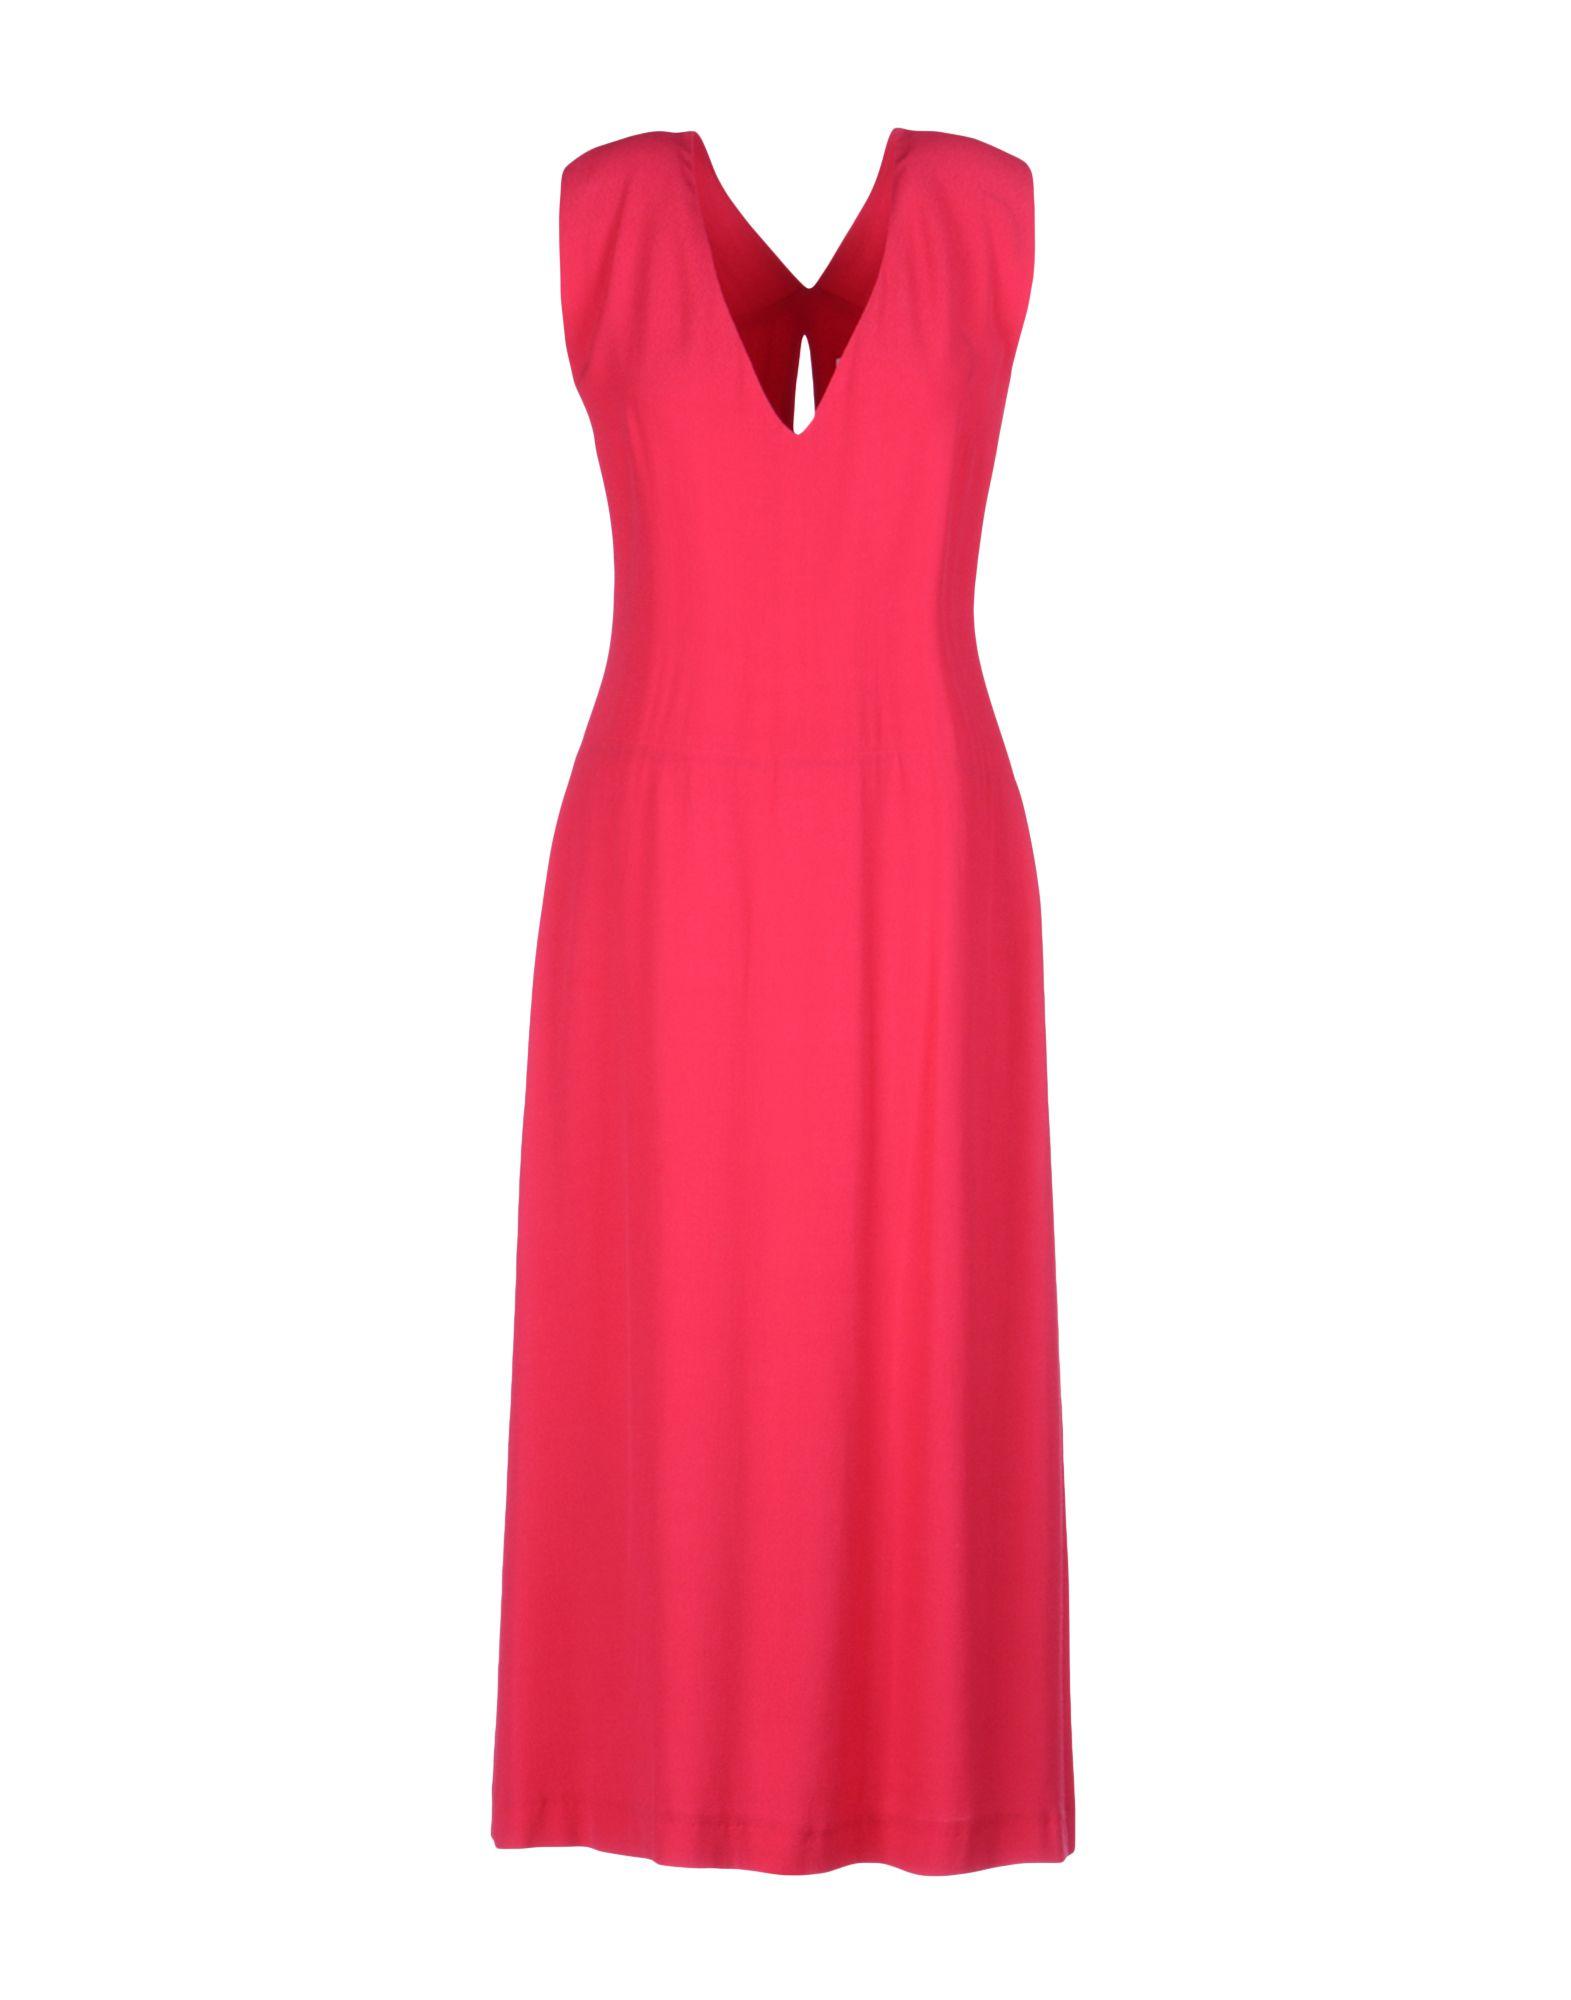 ATTIC AND BARN Damen Knielanges Kleid Farbe Fuchsia Größe 4